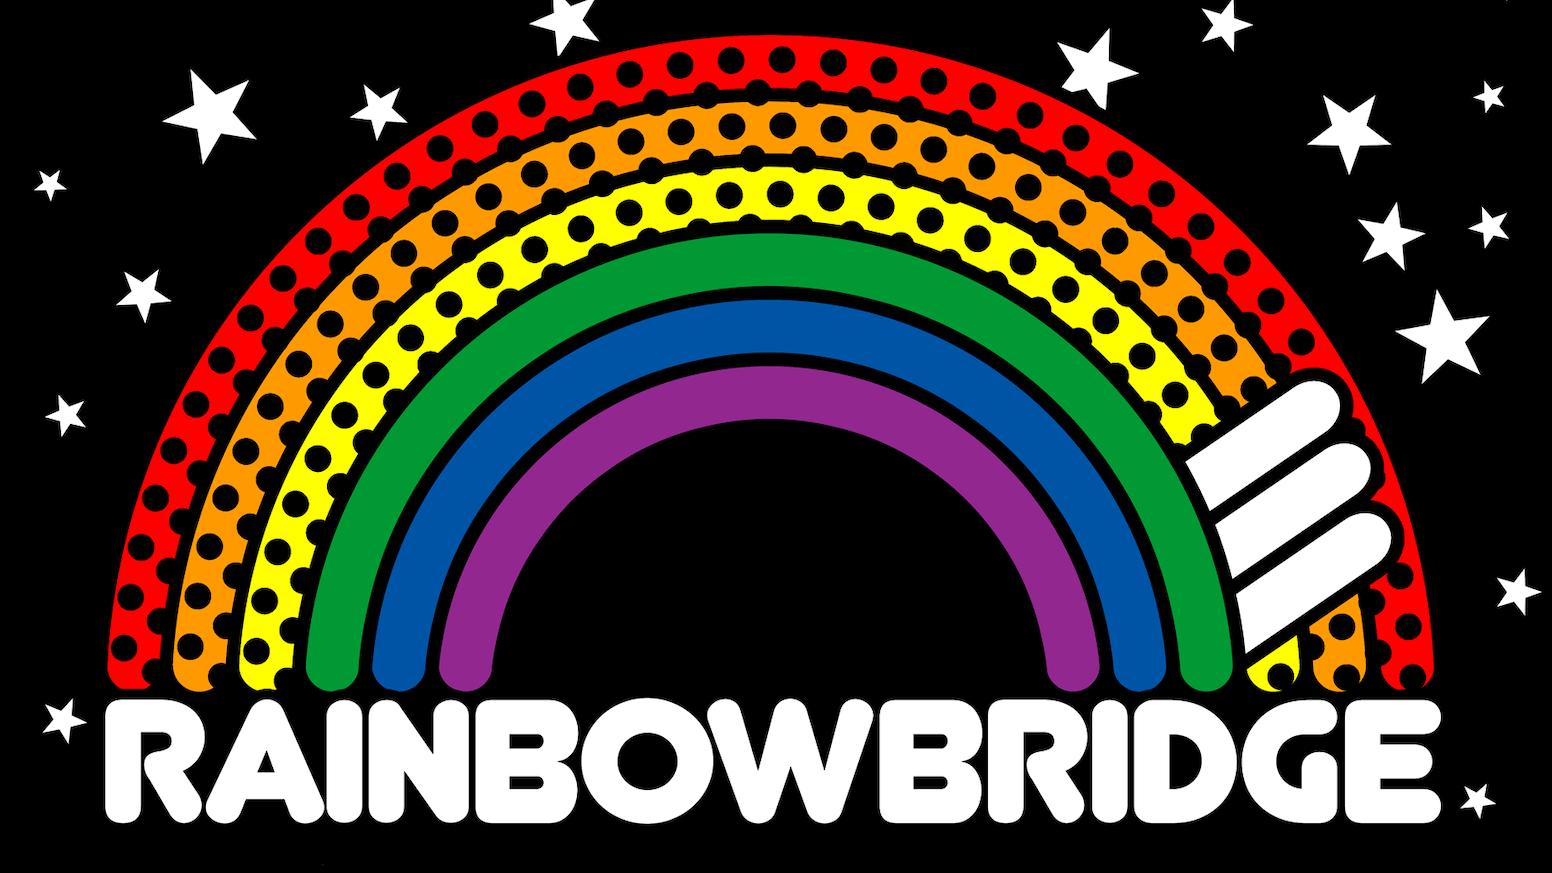 94e20f5c7a778 Rainbow Bridge